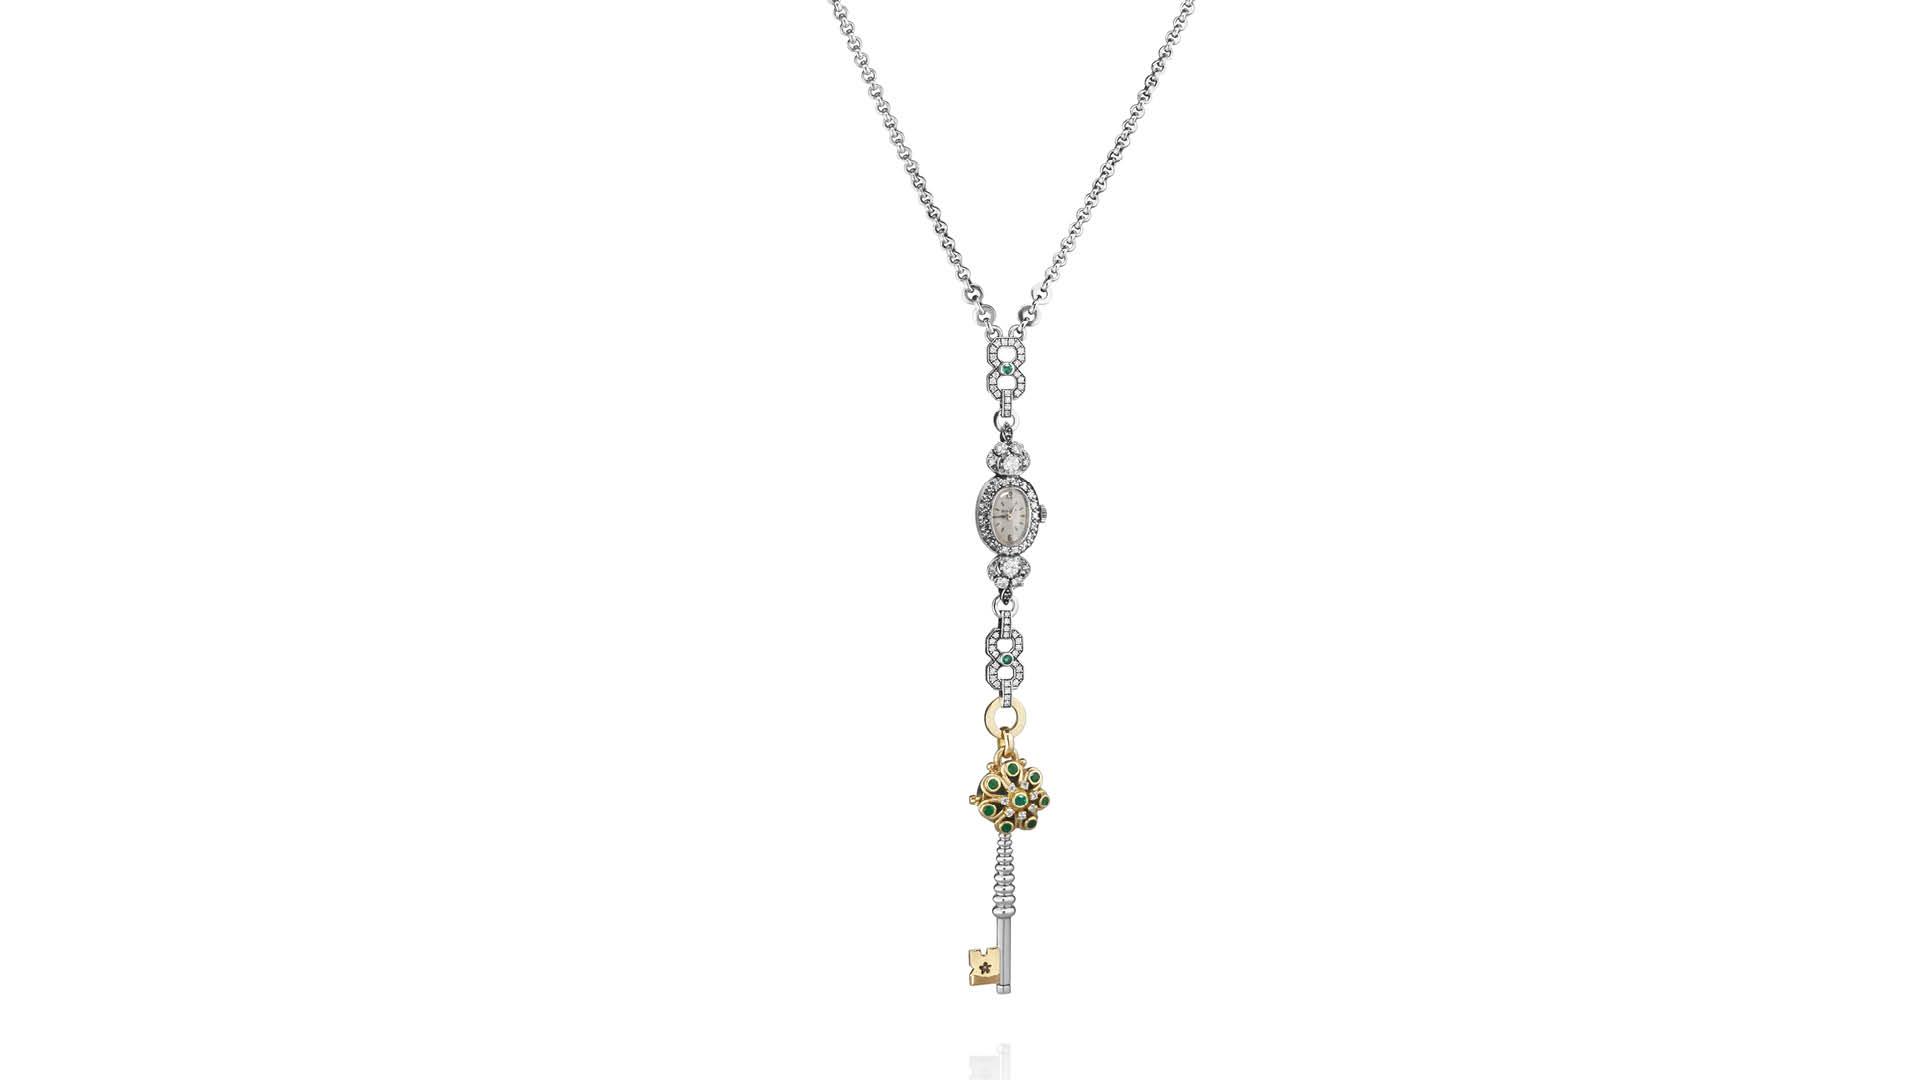 Azza-Fahmy-Timeless-Pendant-Necklace